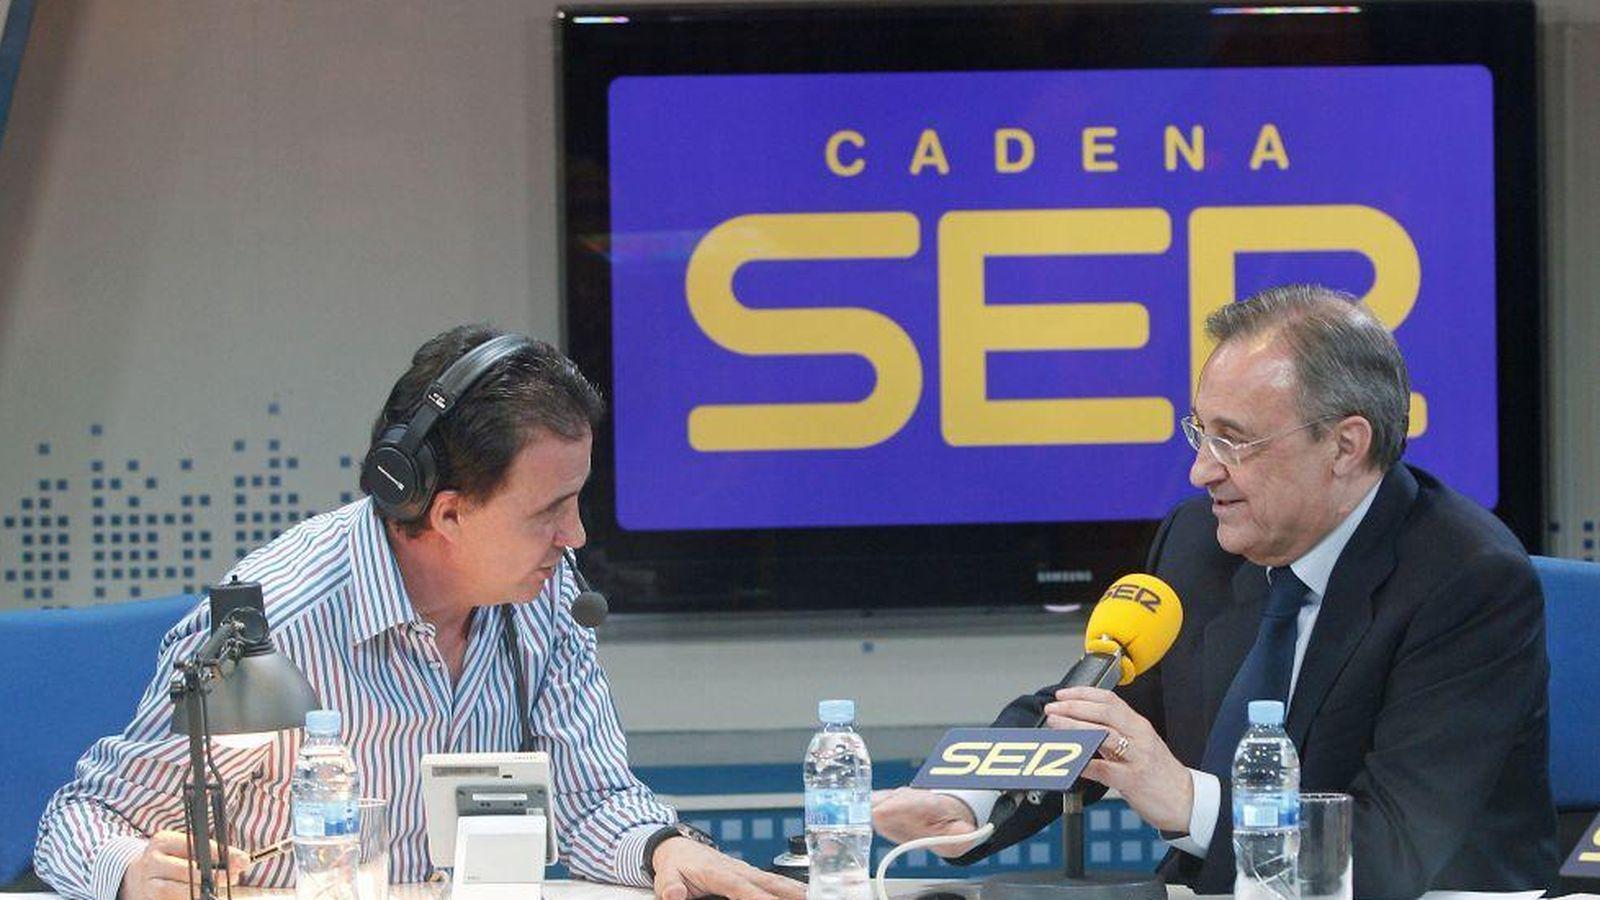 Foto: Florentino Pérez junto a José Ramón de la Morena (Foto: Cadena Ser)